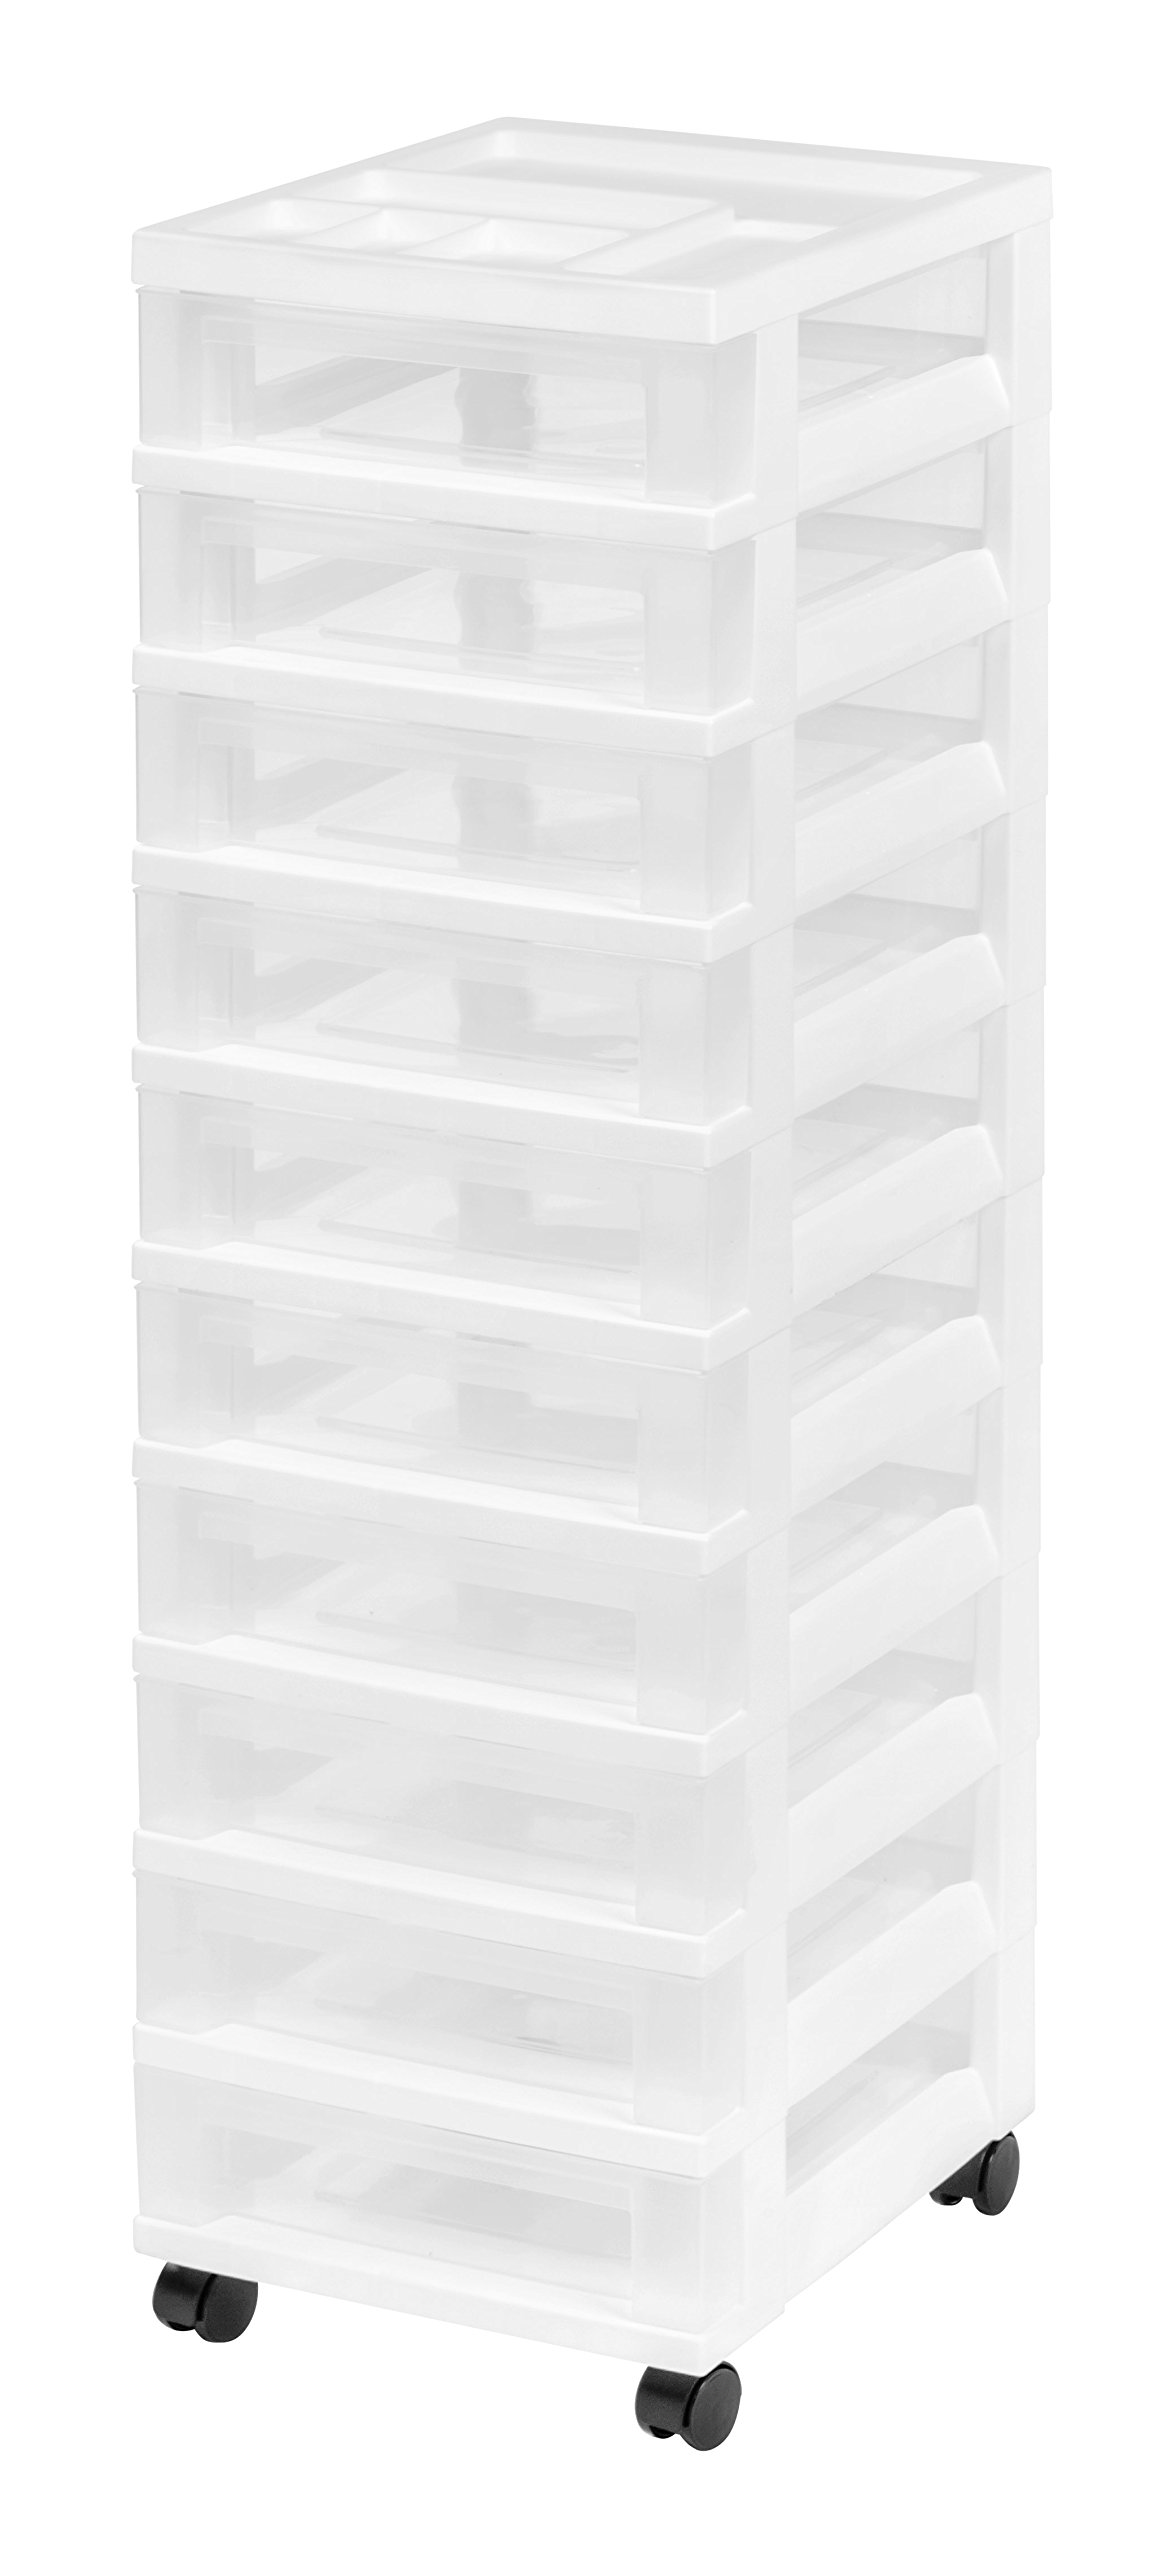 IRIS 10-Drawer Rolling Storage Cart with Organizer Top, White by IRIS USA, Inc.